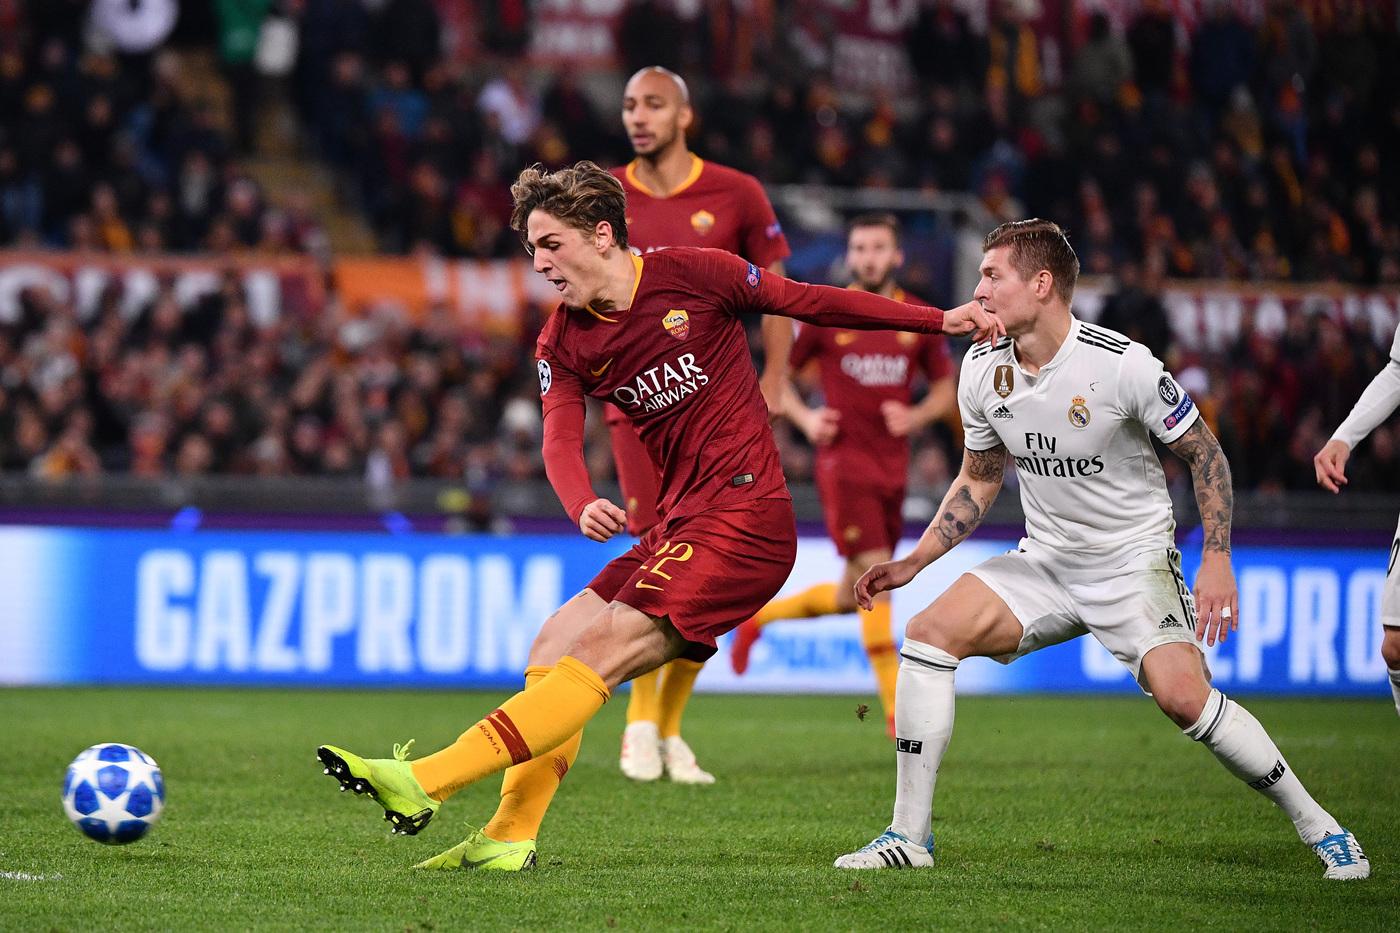 Soi kèo Roma vs Lecce